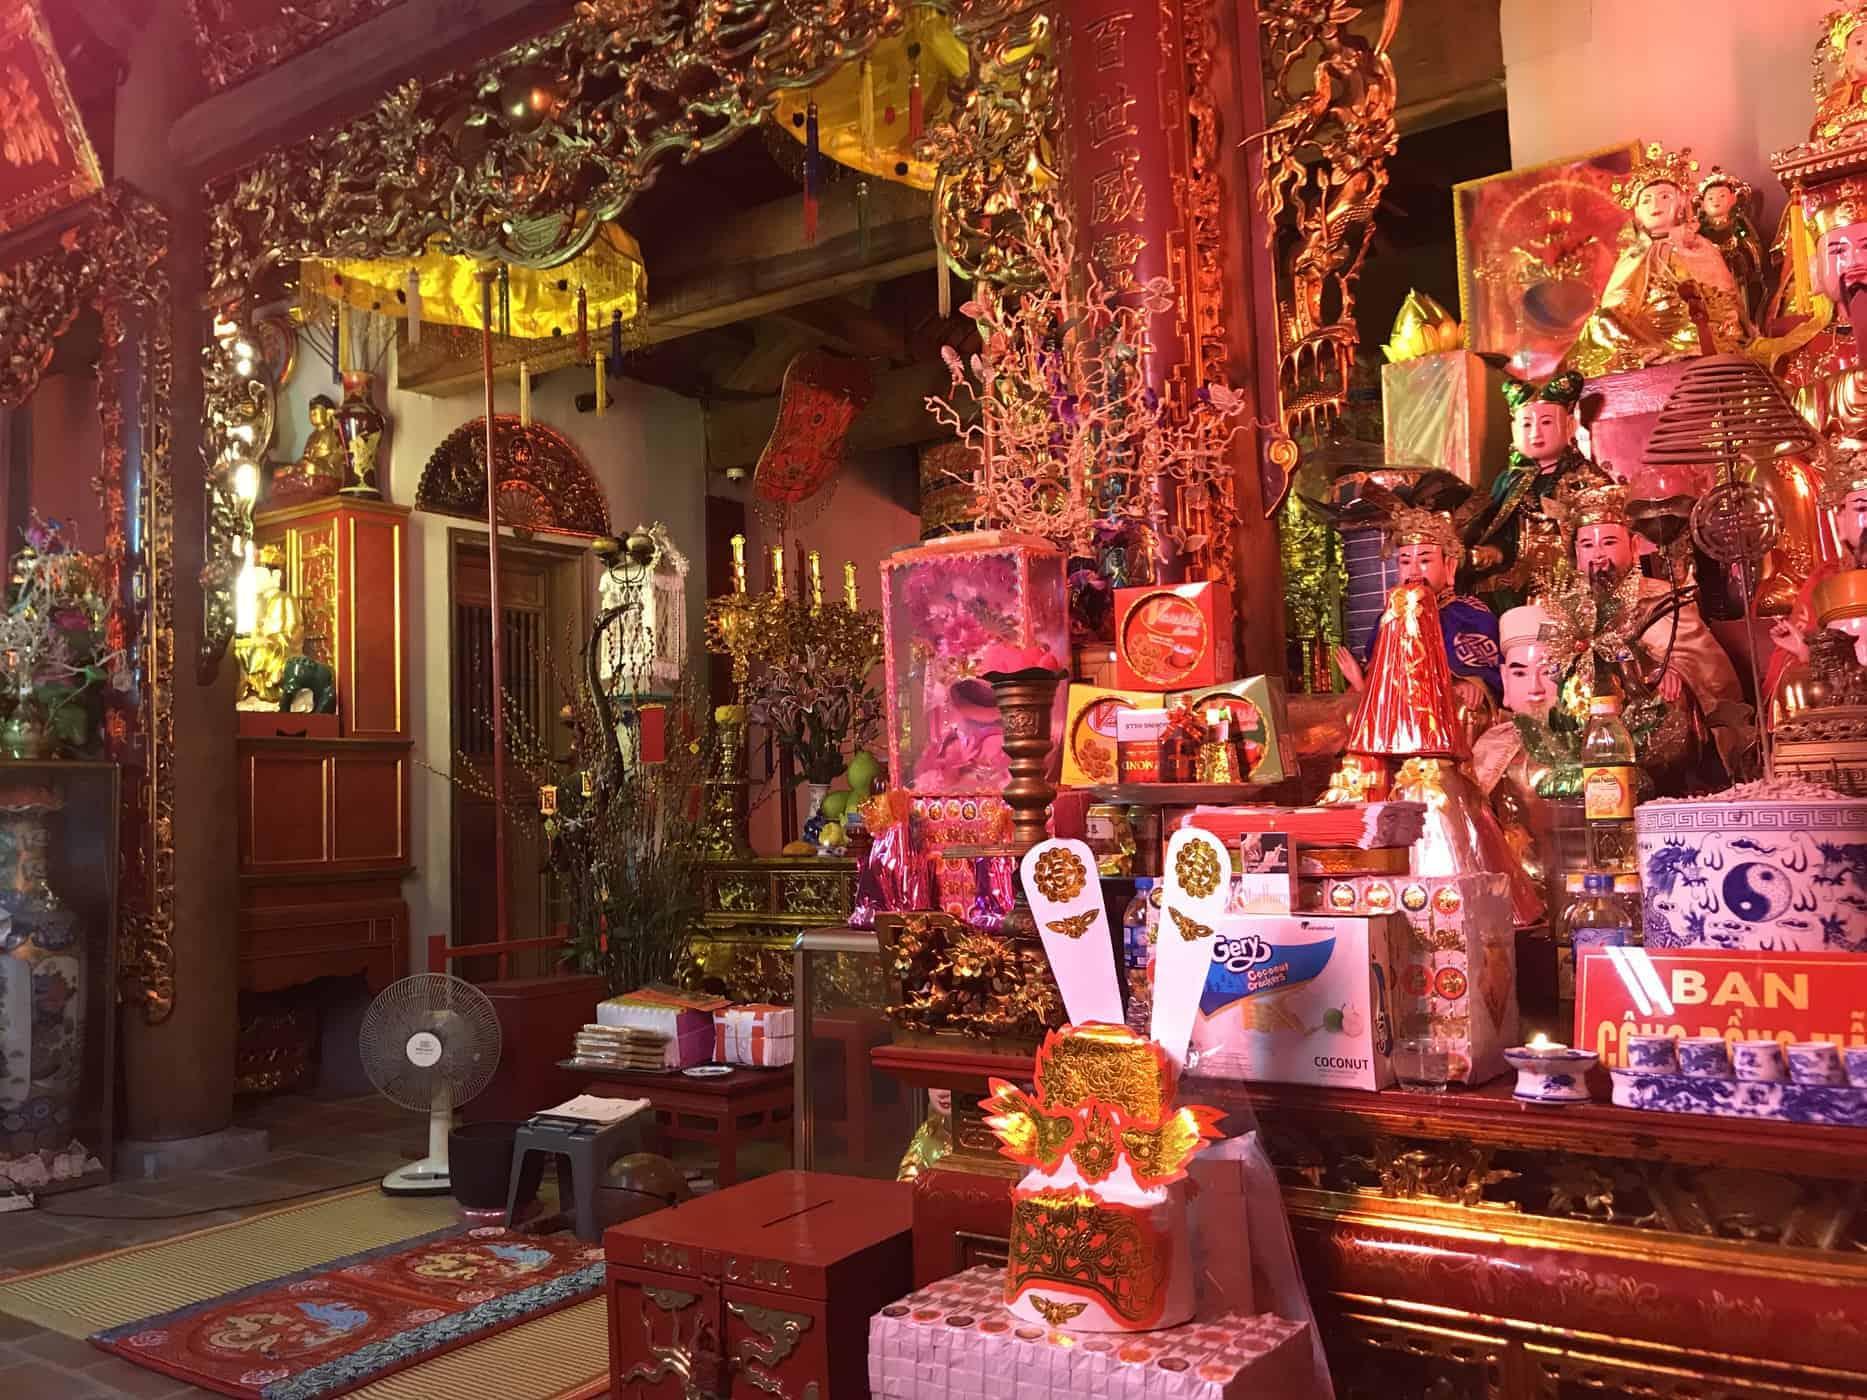 A Colourful Display inside a Pagoda in Hanoi